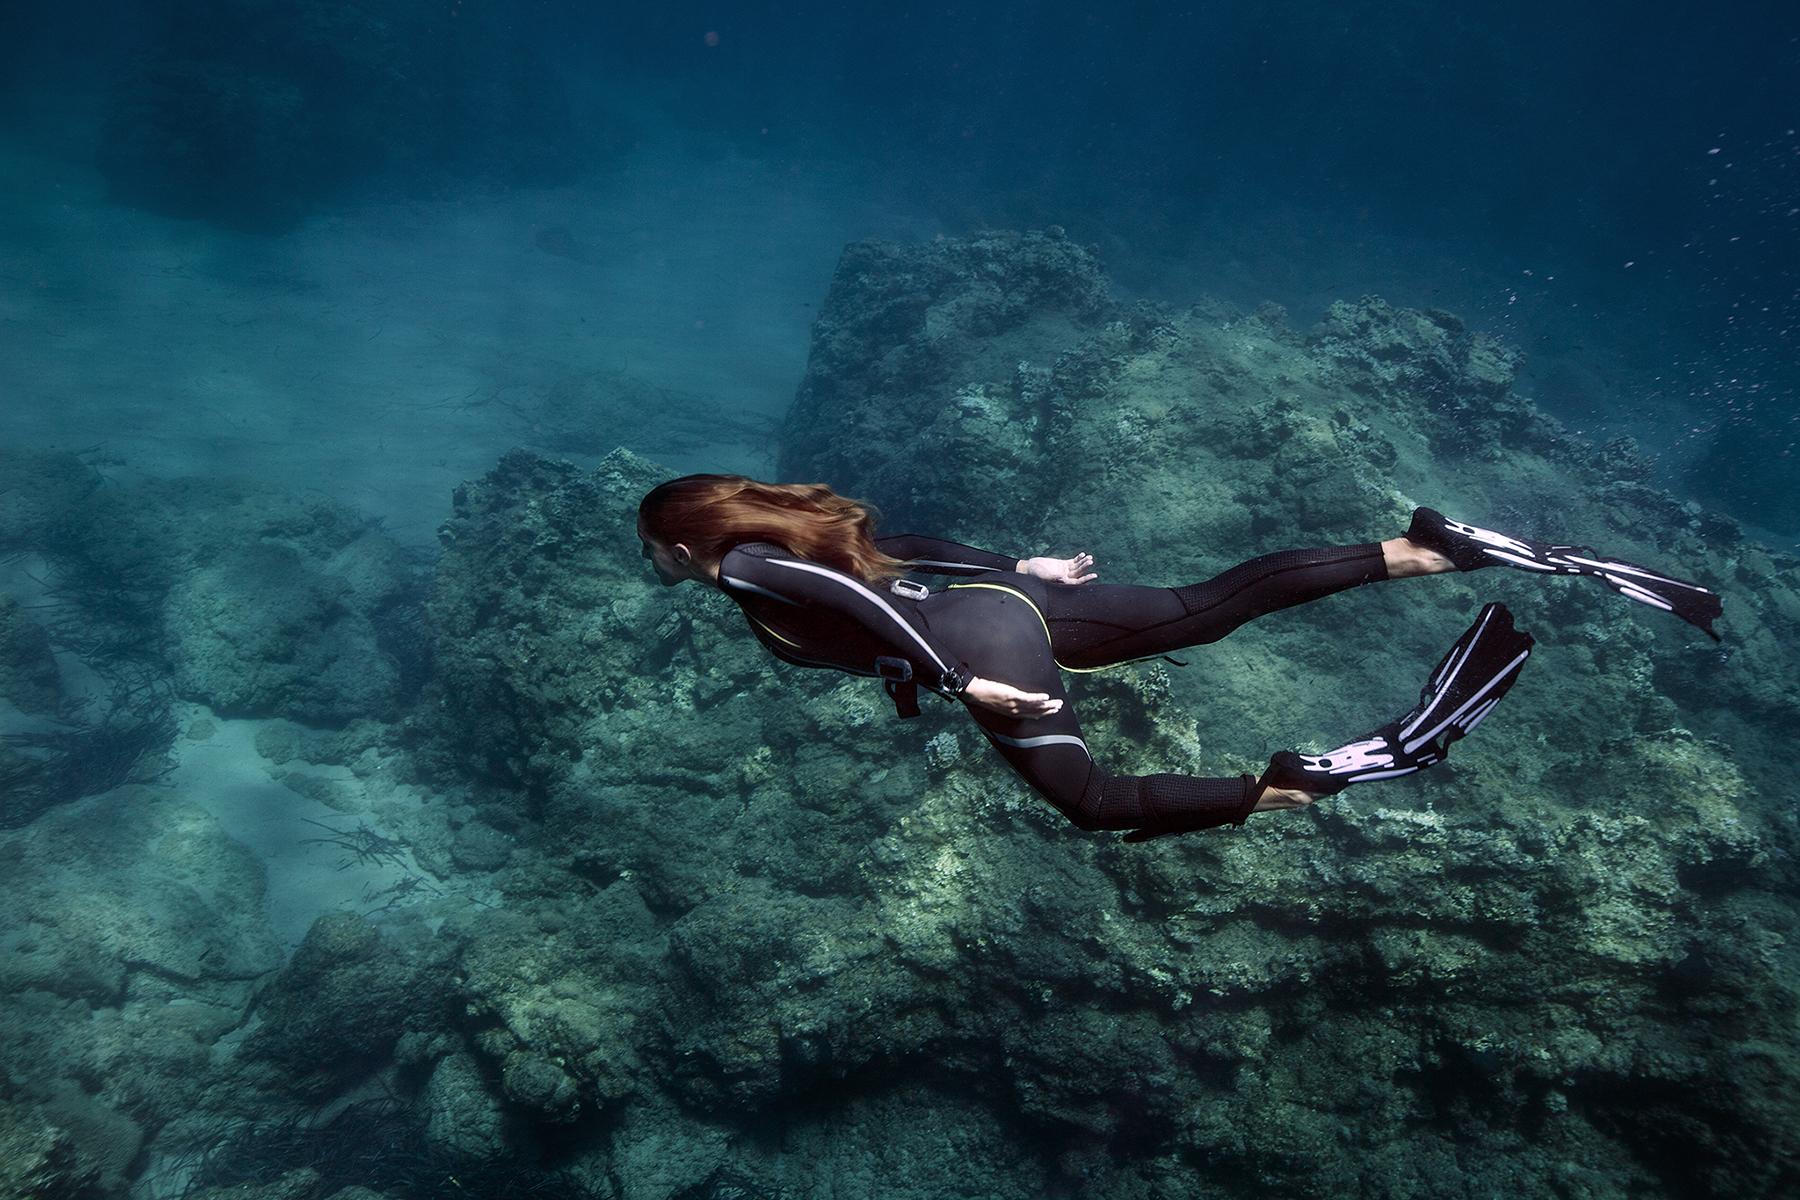 PDM 7734 / Longines legend diver ©Peter De mulder